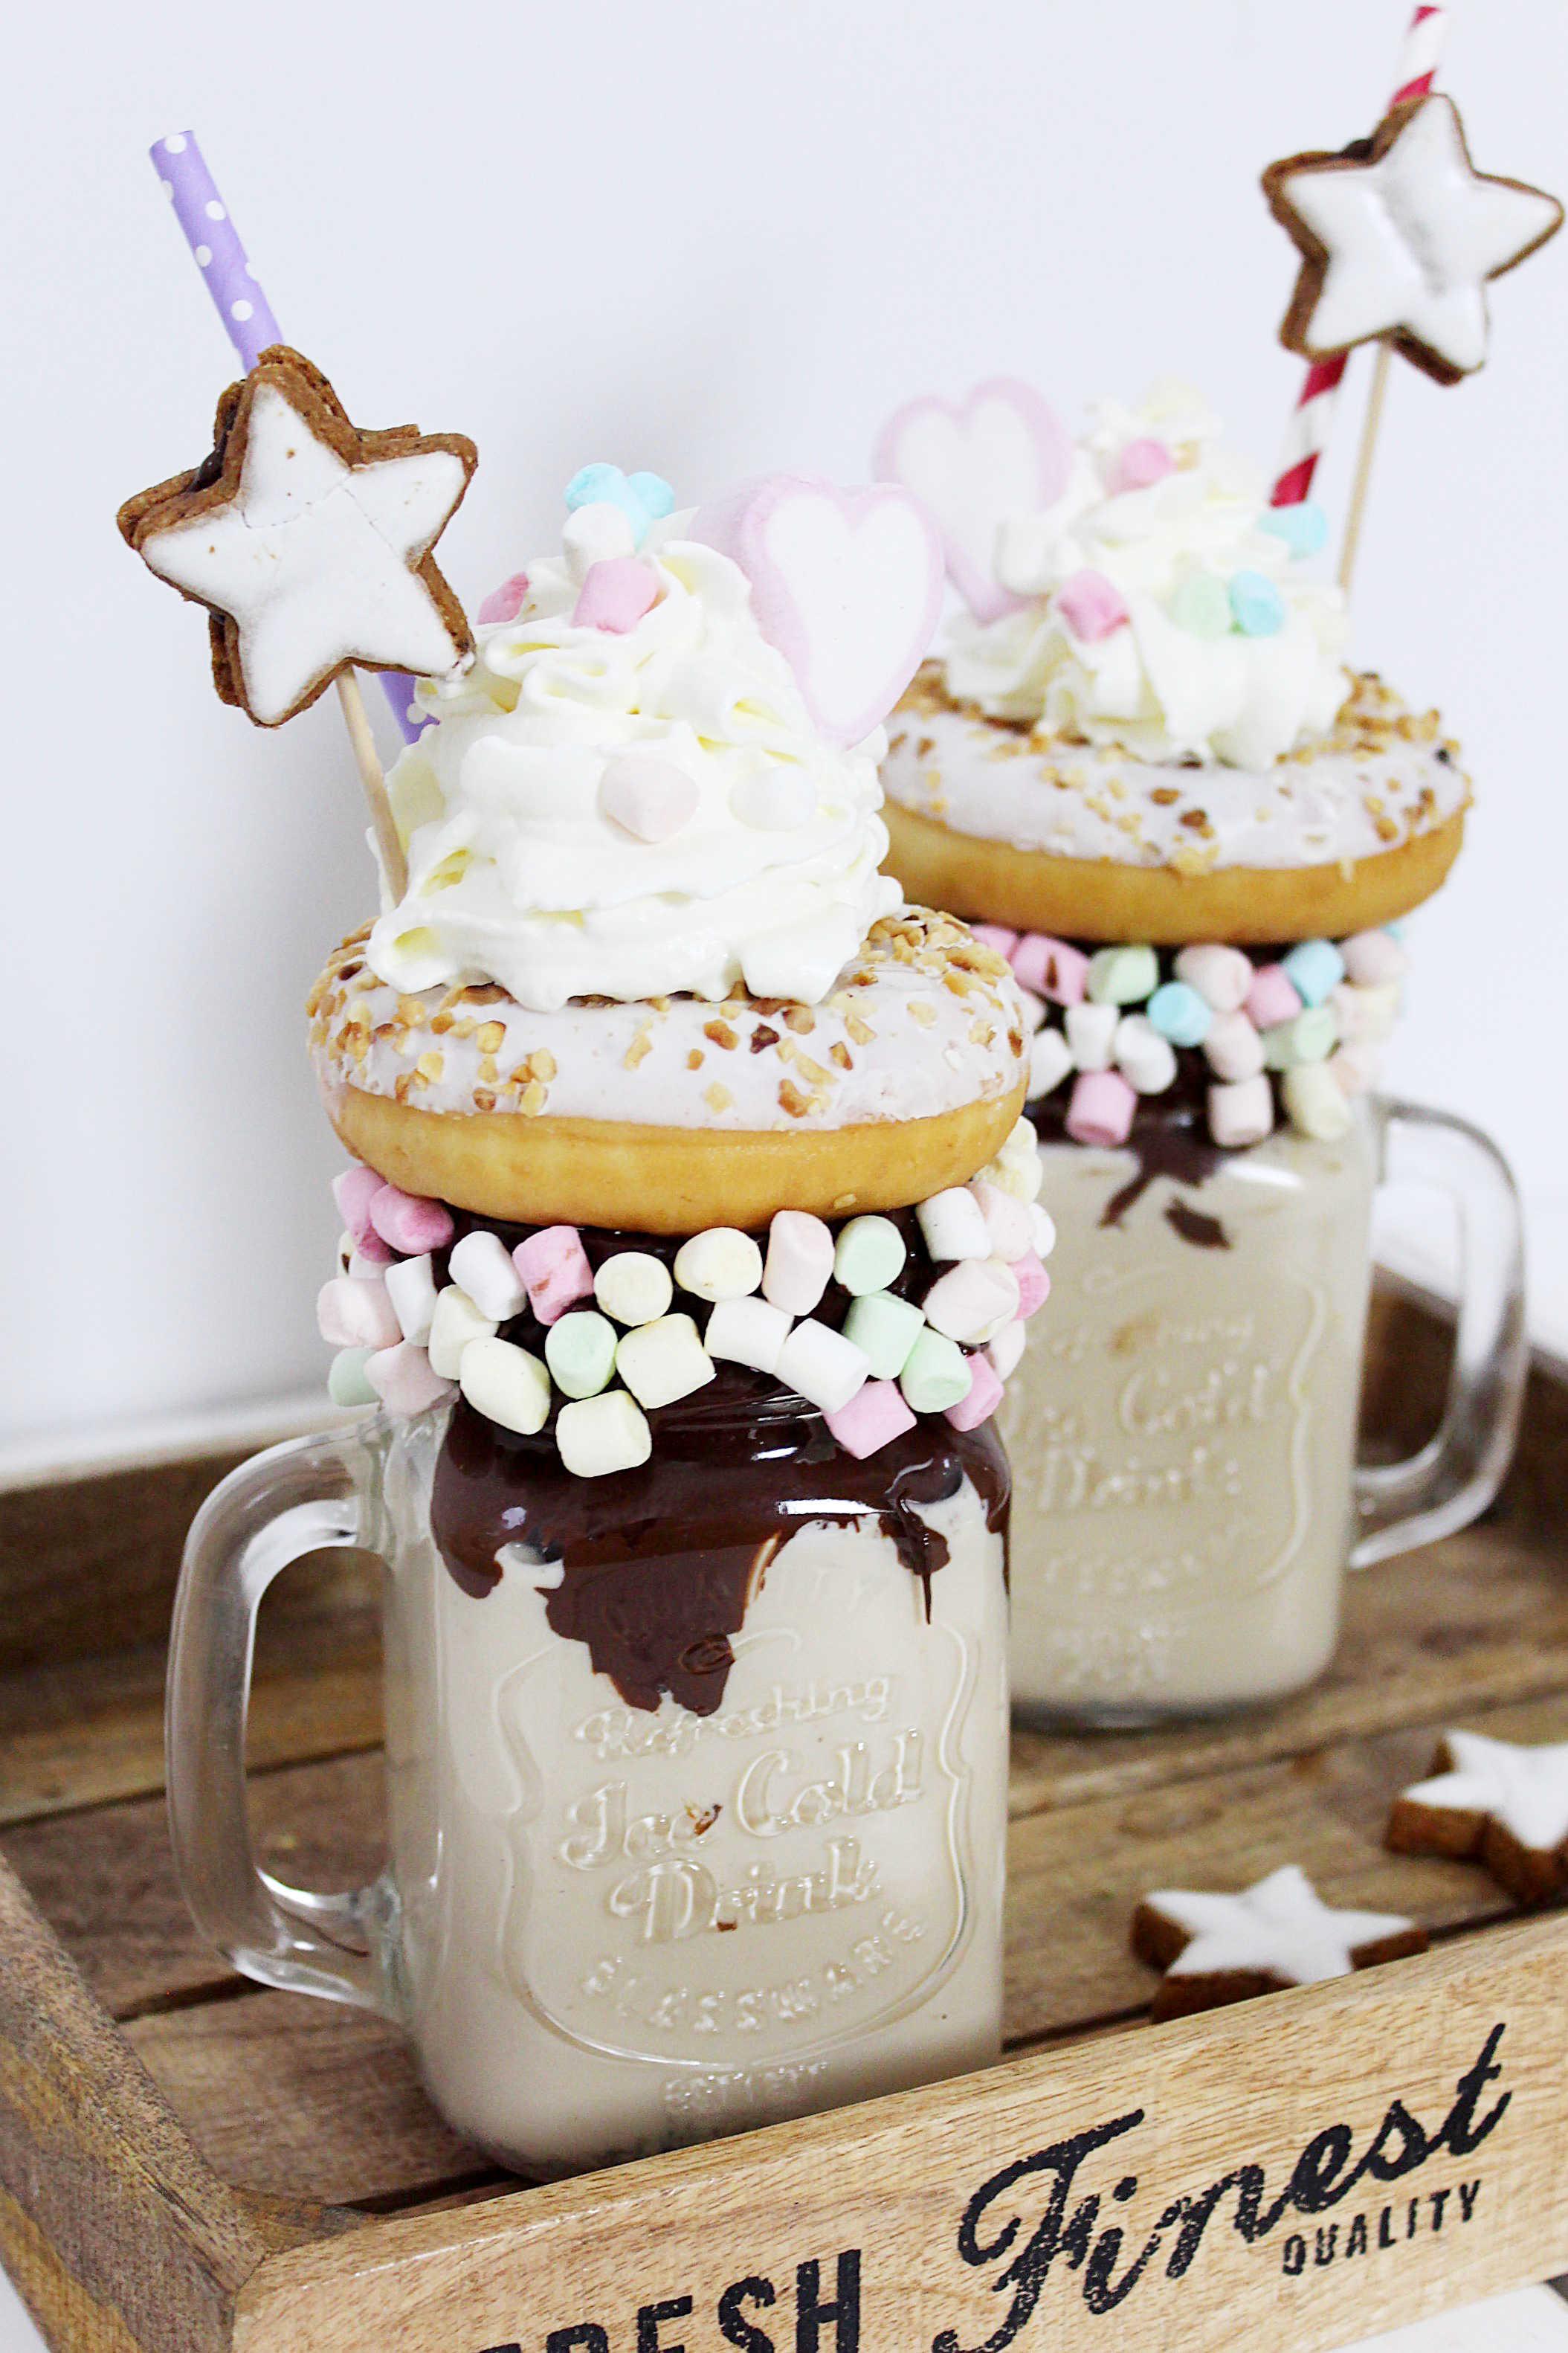 Chai-latte-rezept-freakshakes-selber-machen-diy-blog